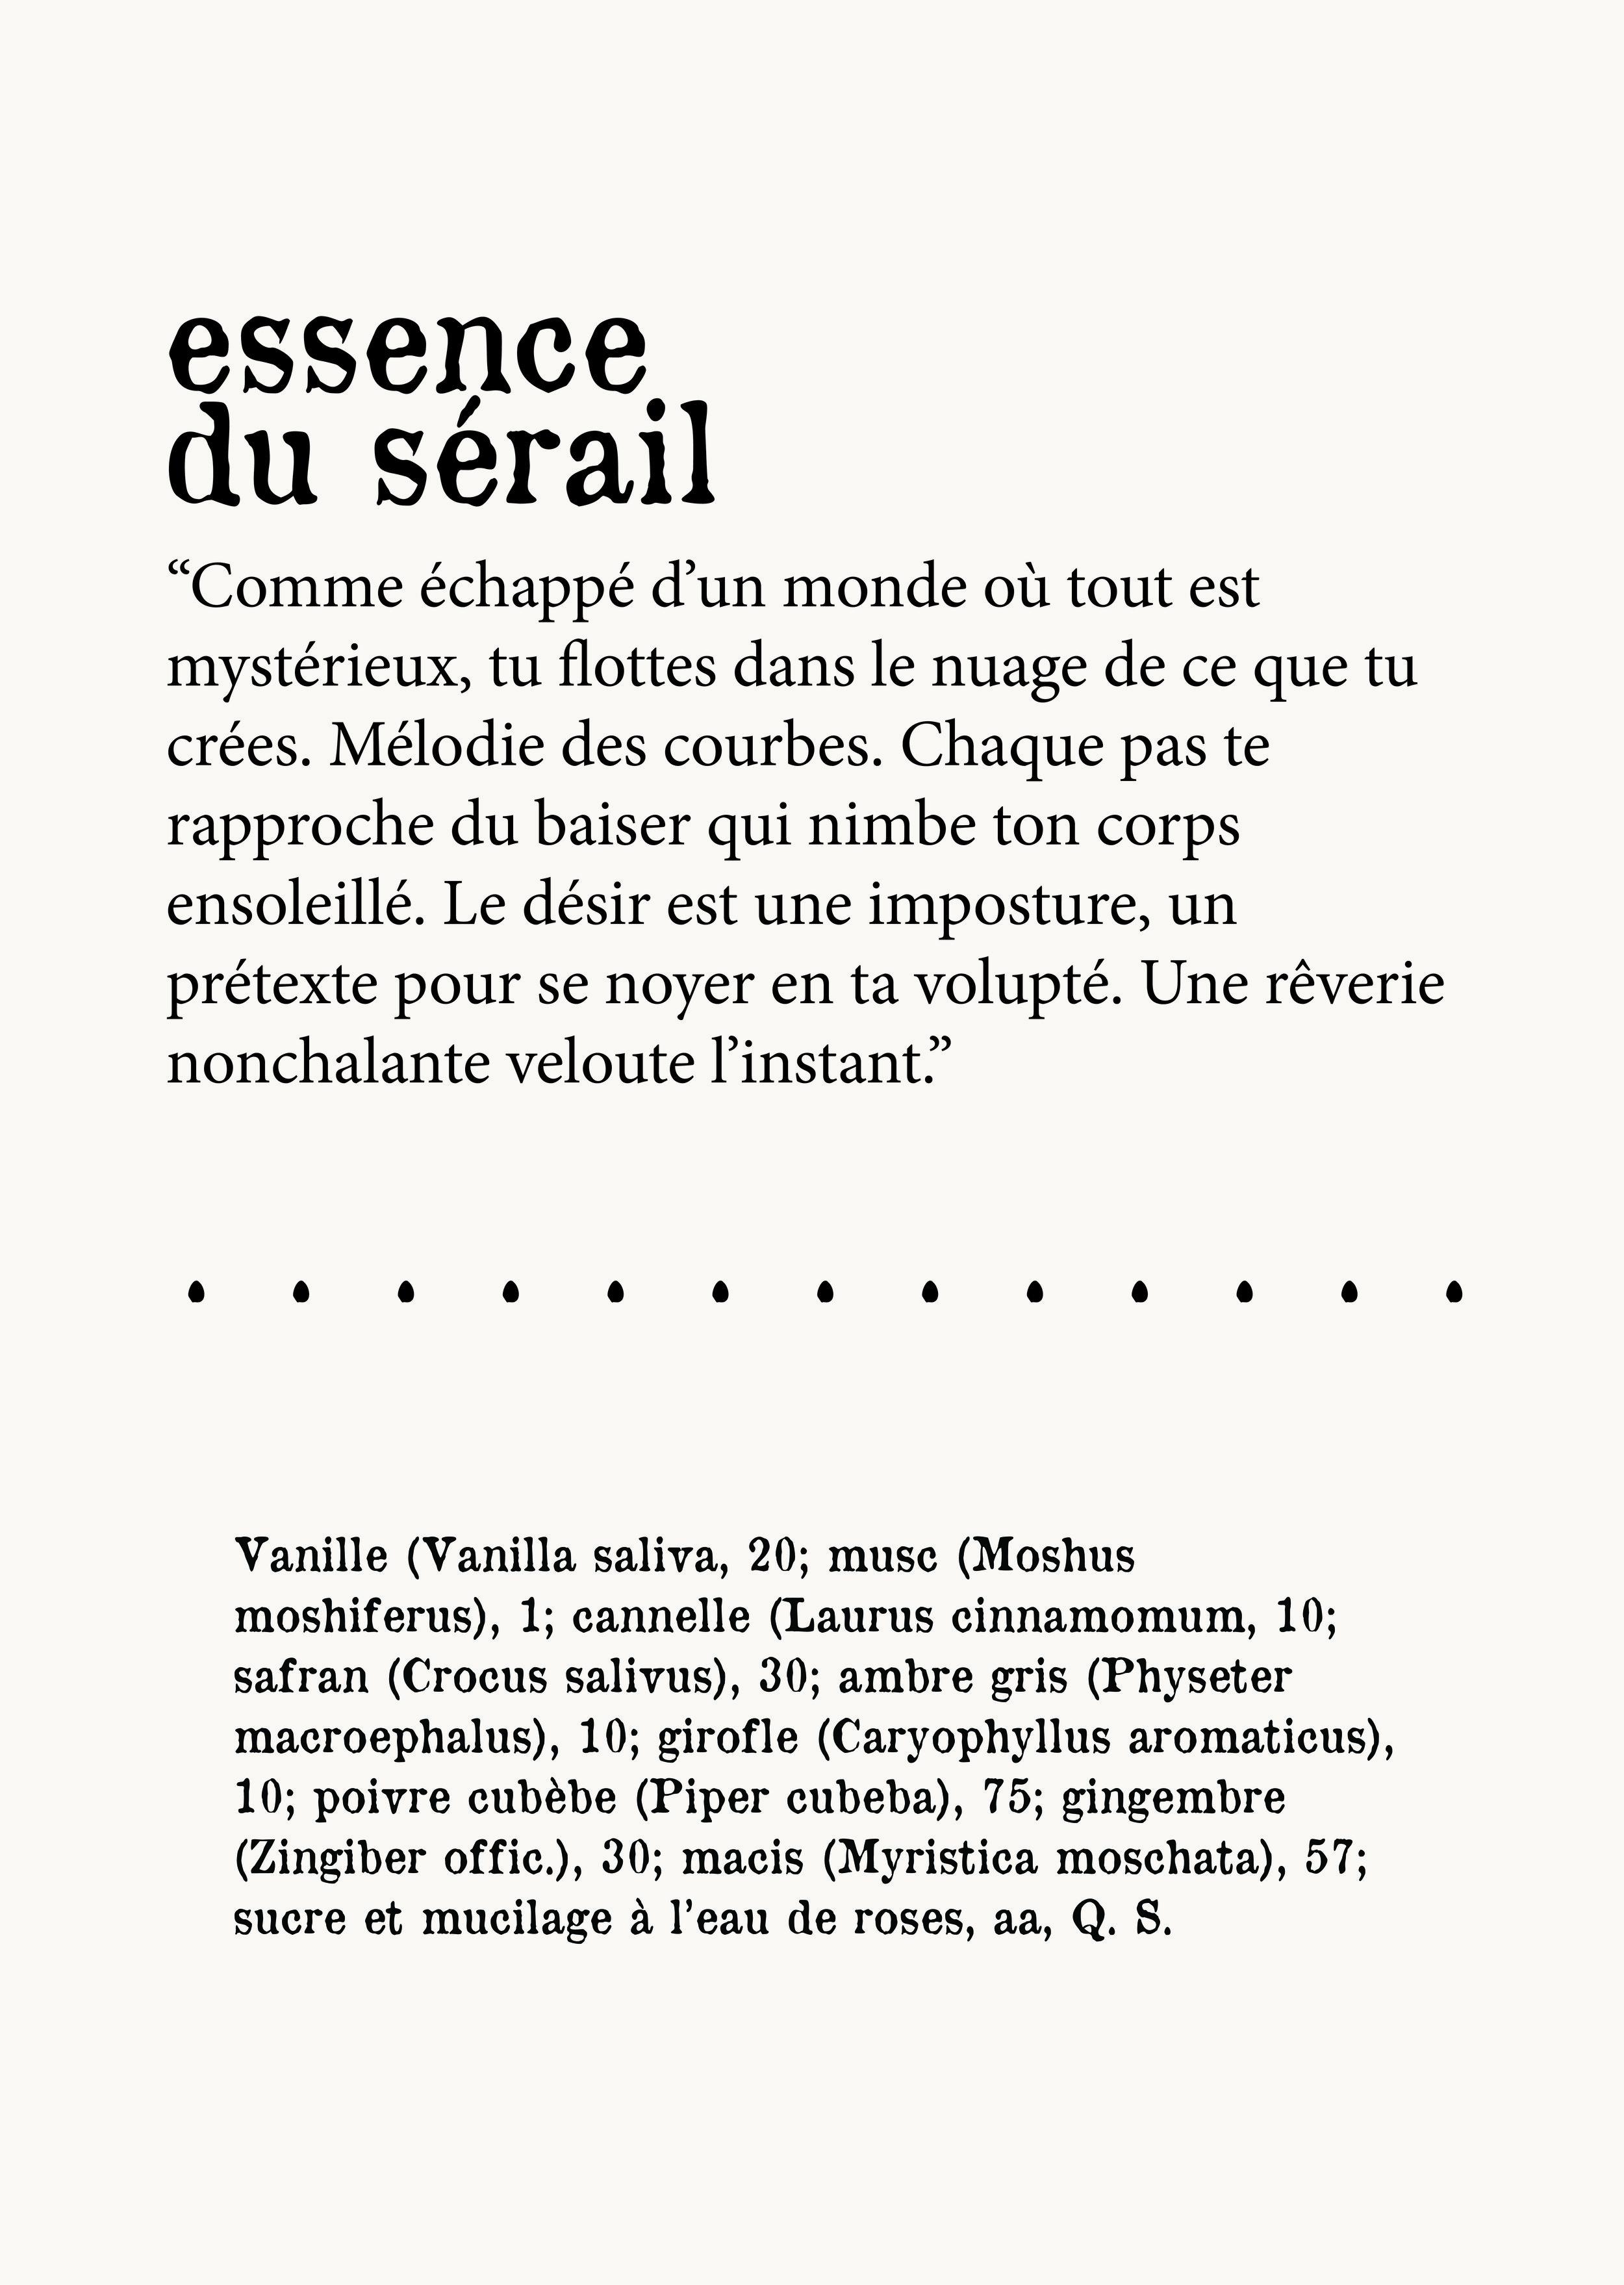 website essence du serail fr.jpg